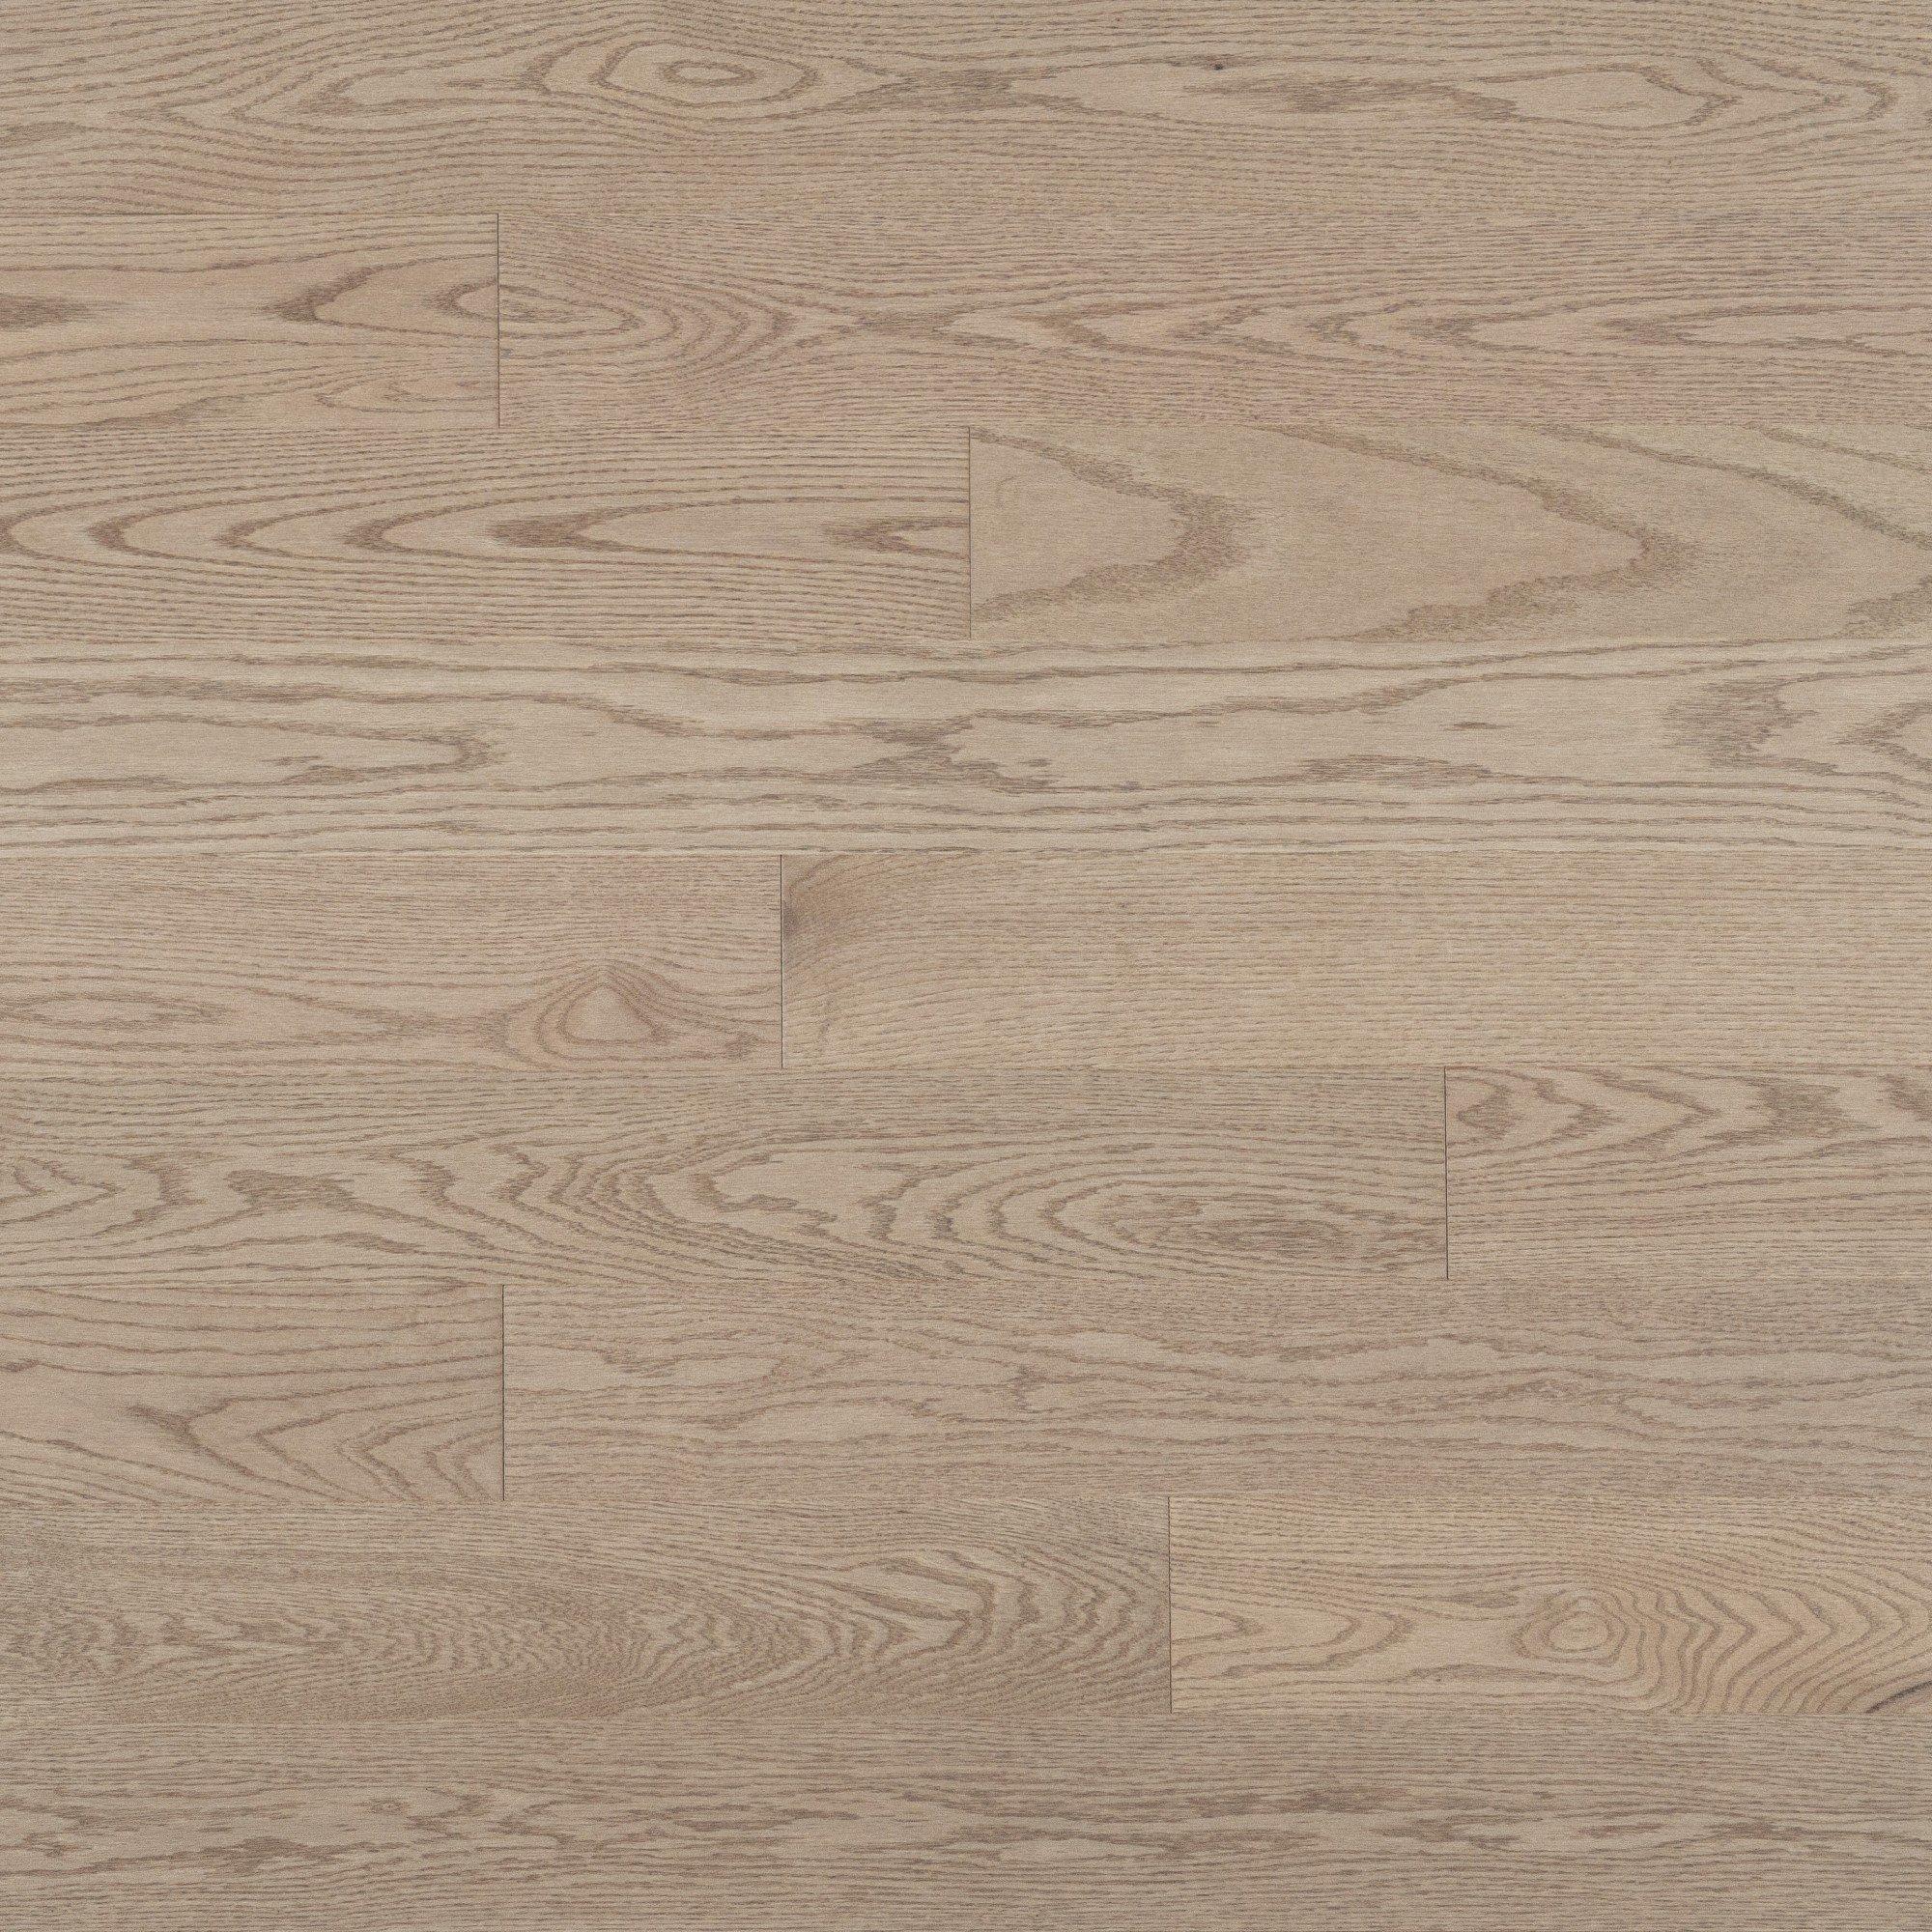 Chêne rouge Rio Exclusive Lisse - Image plancher